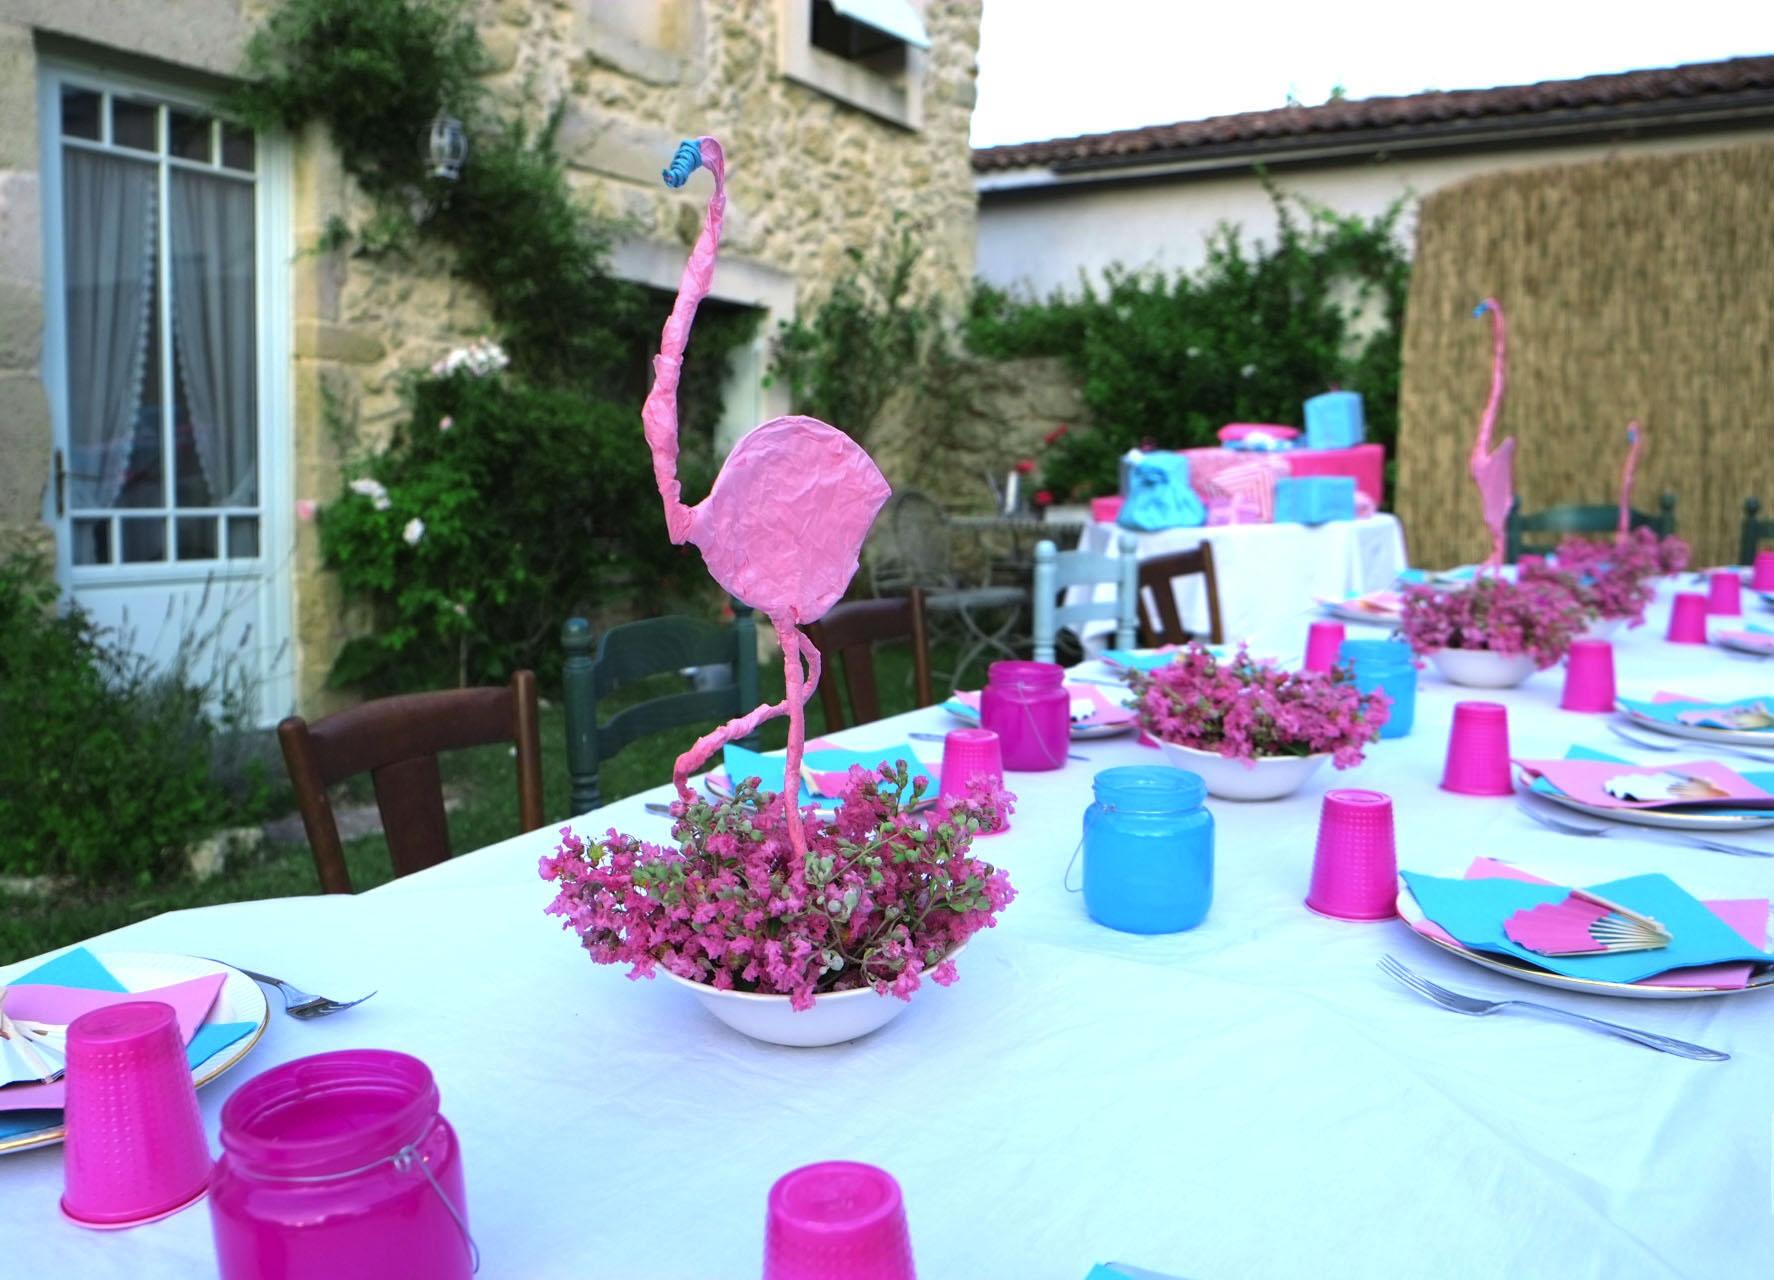 Flamingo birthday 3 flamant rose et lilas des indes mon bento v g tarien - Decoration flamant rose ...